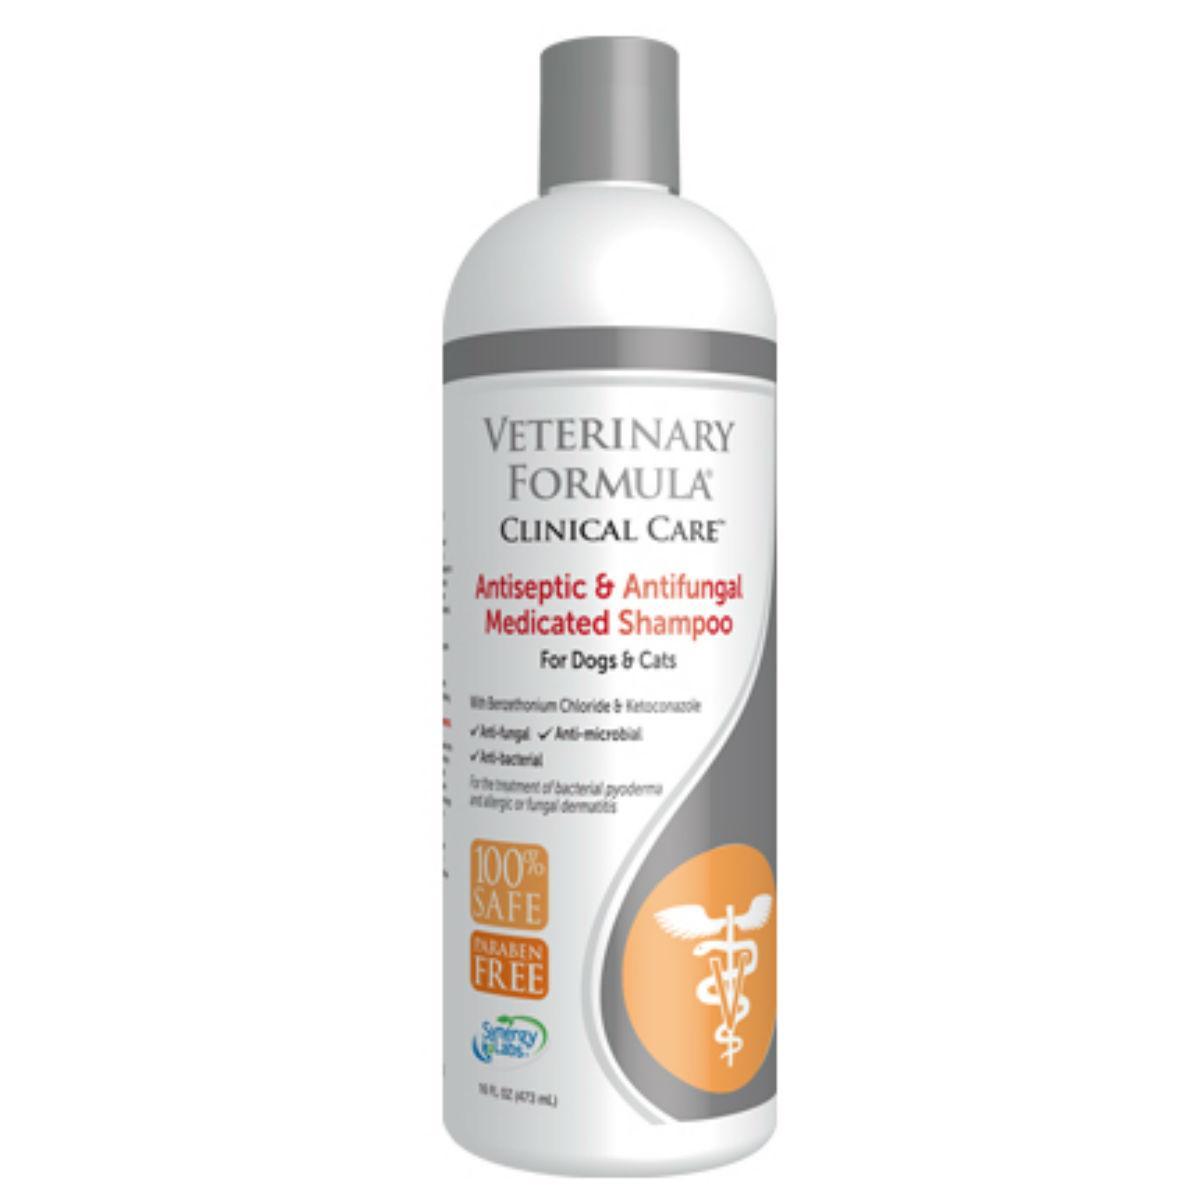 Veterinary Formula Clinical Care Antiseptic & Antifungal Medicated Dog Shampoo